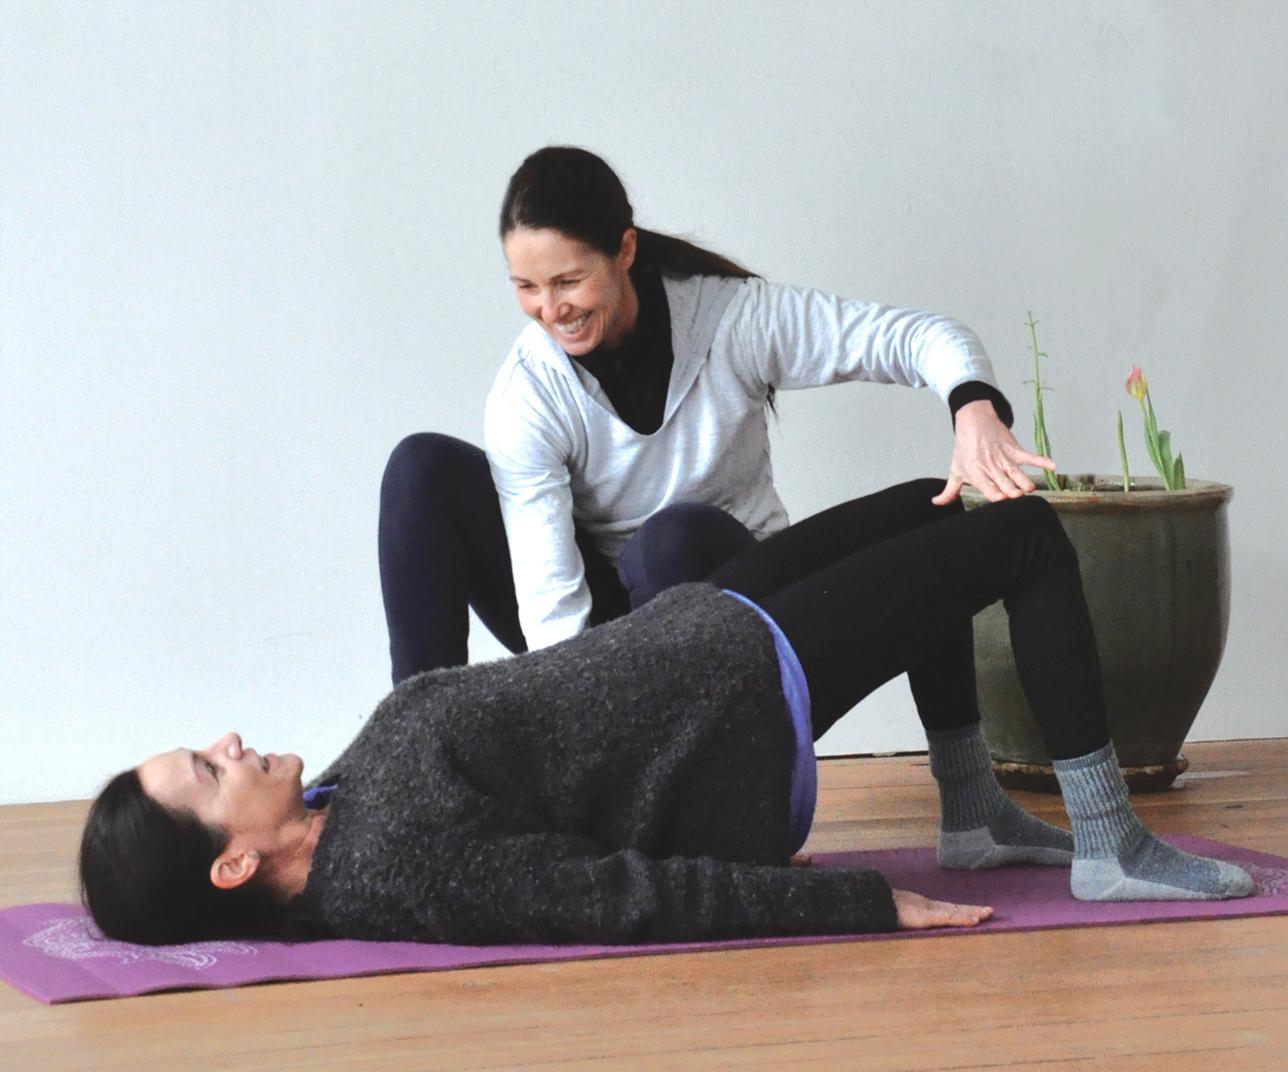 Beginning your Pilates journey with Patti Jo Amerein at Ten Pilates Studio in Walla Walla.